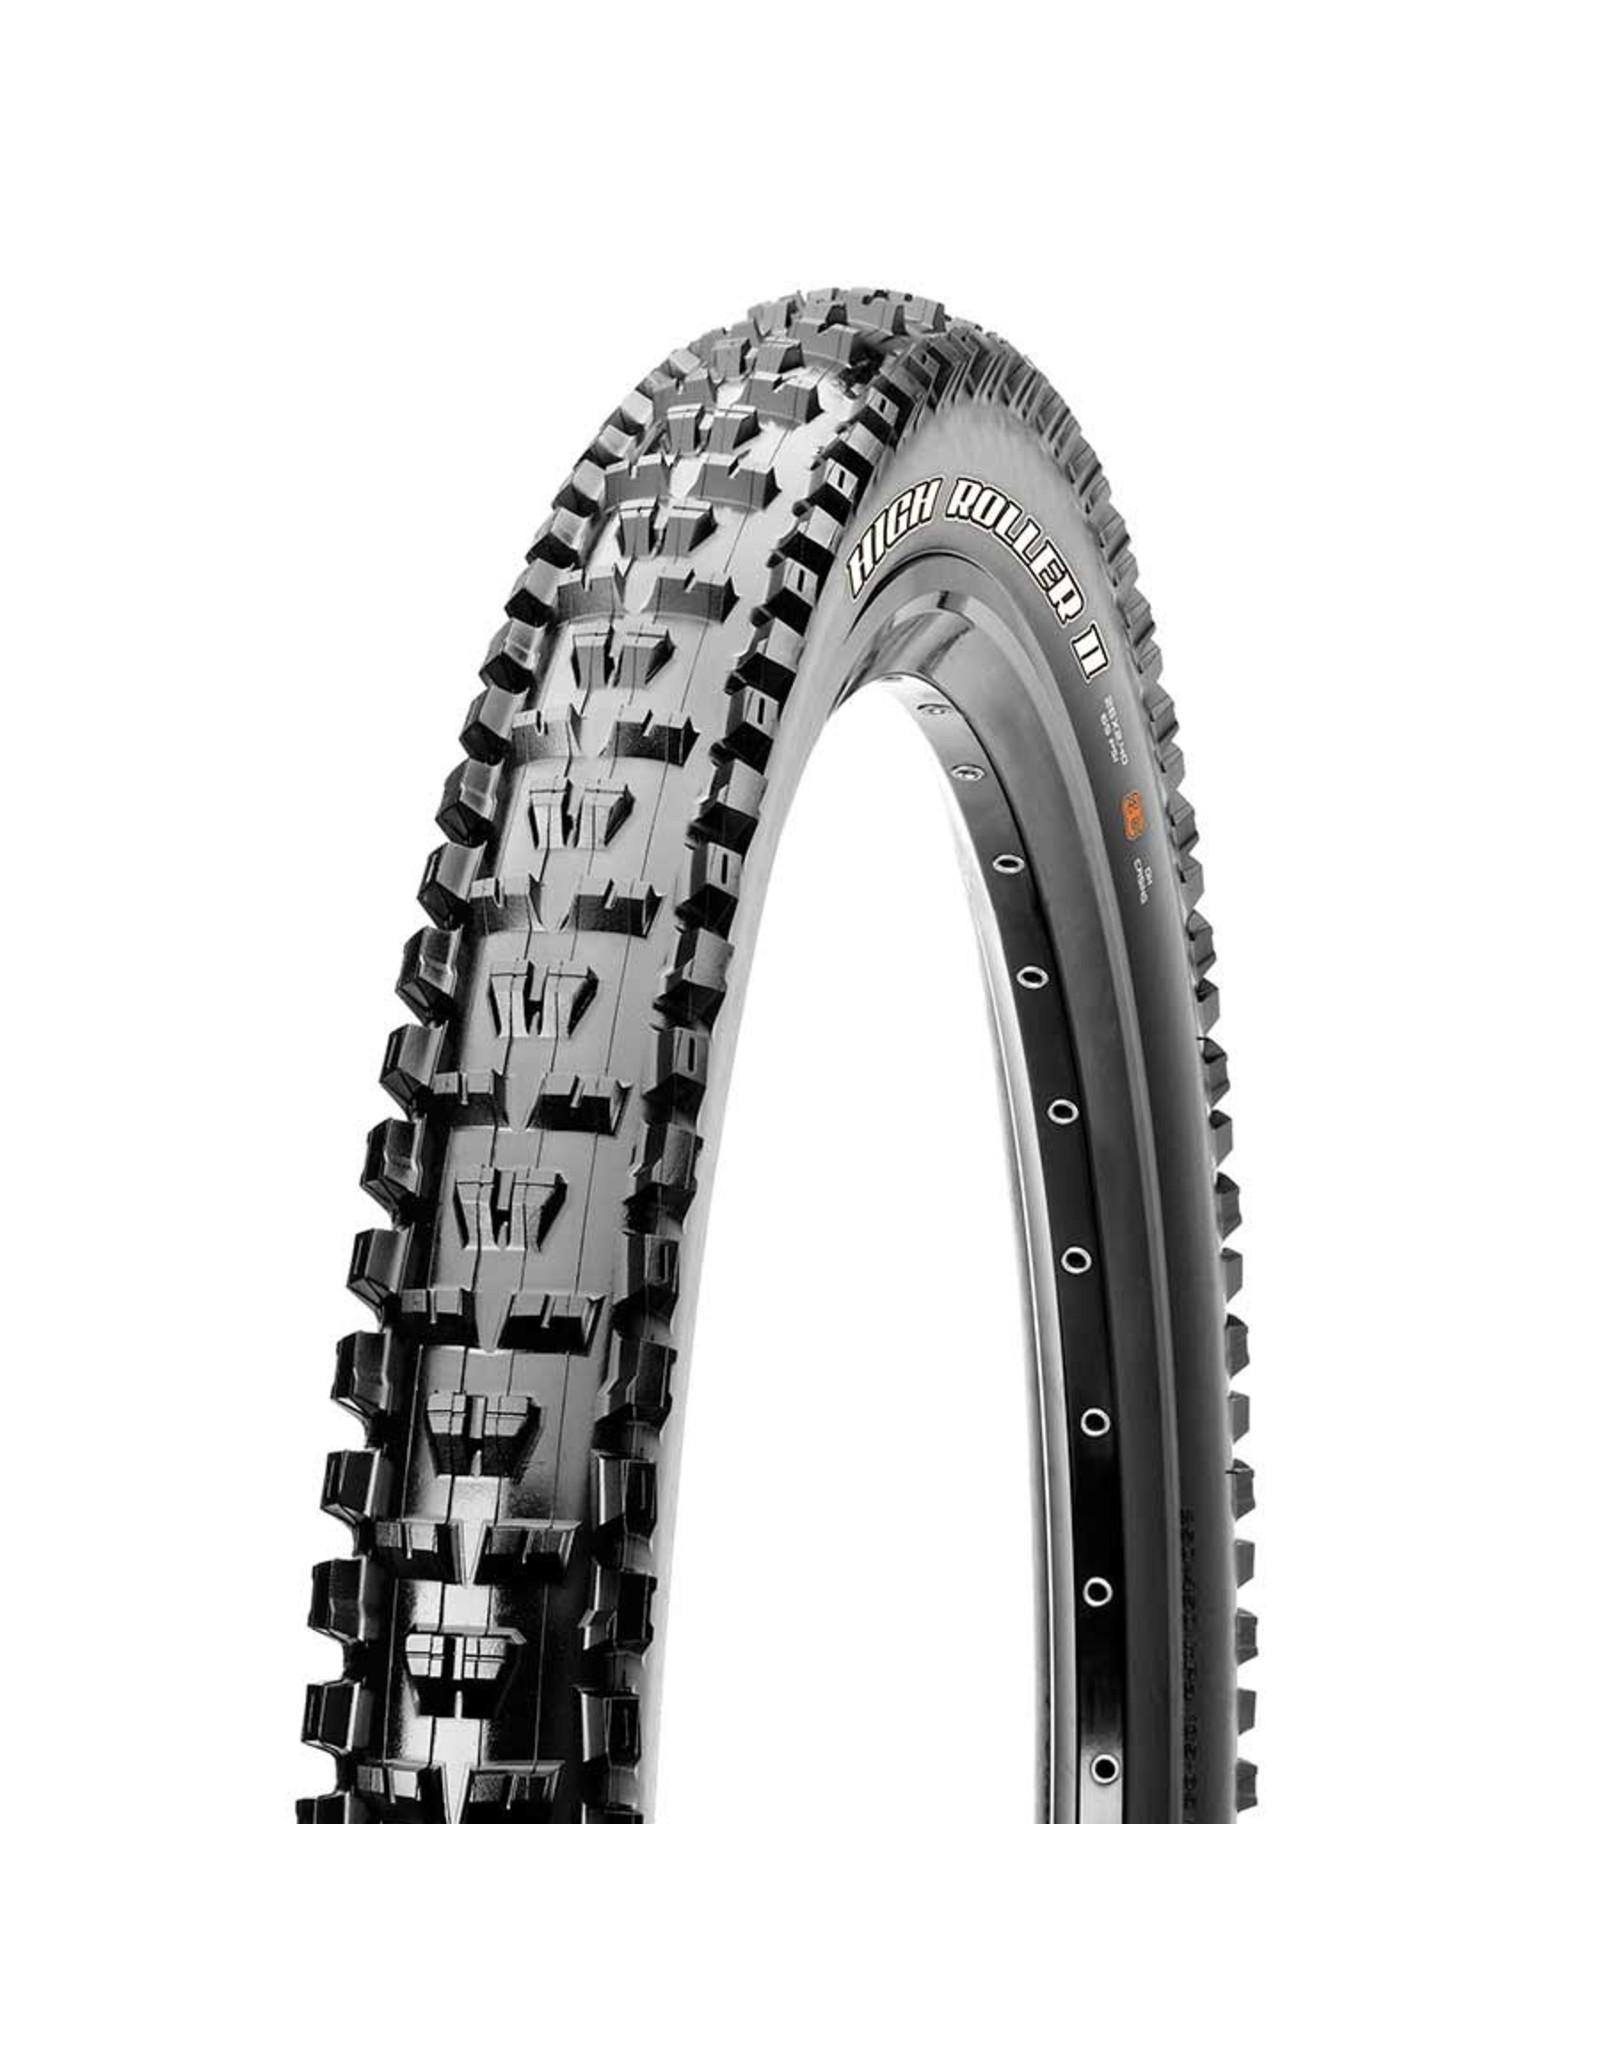 Maxxis, High Roller II, Tire, 26''x2.30, Folding, Tubeless Ready, Dual, EXO, 60TPI, Black